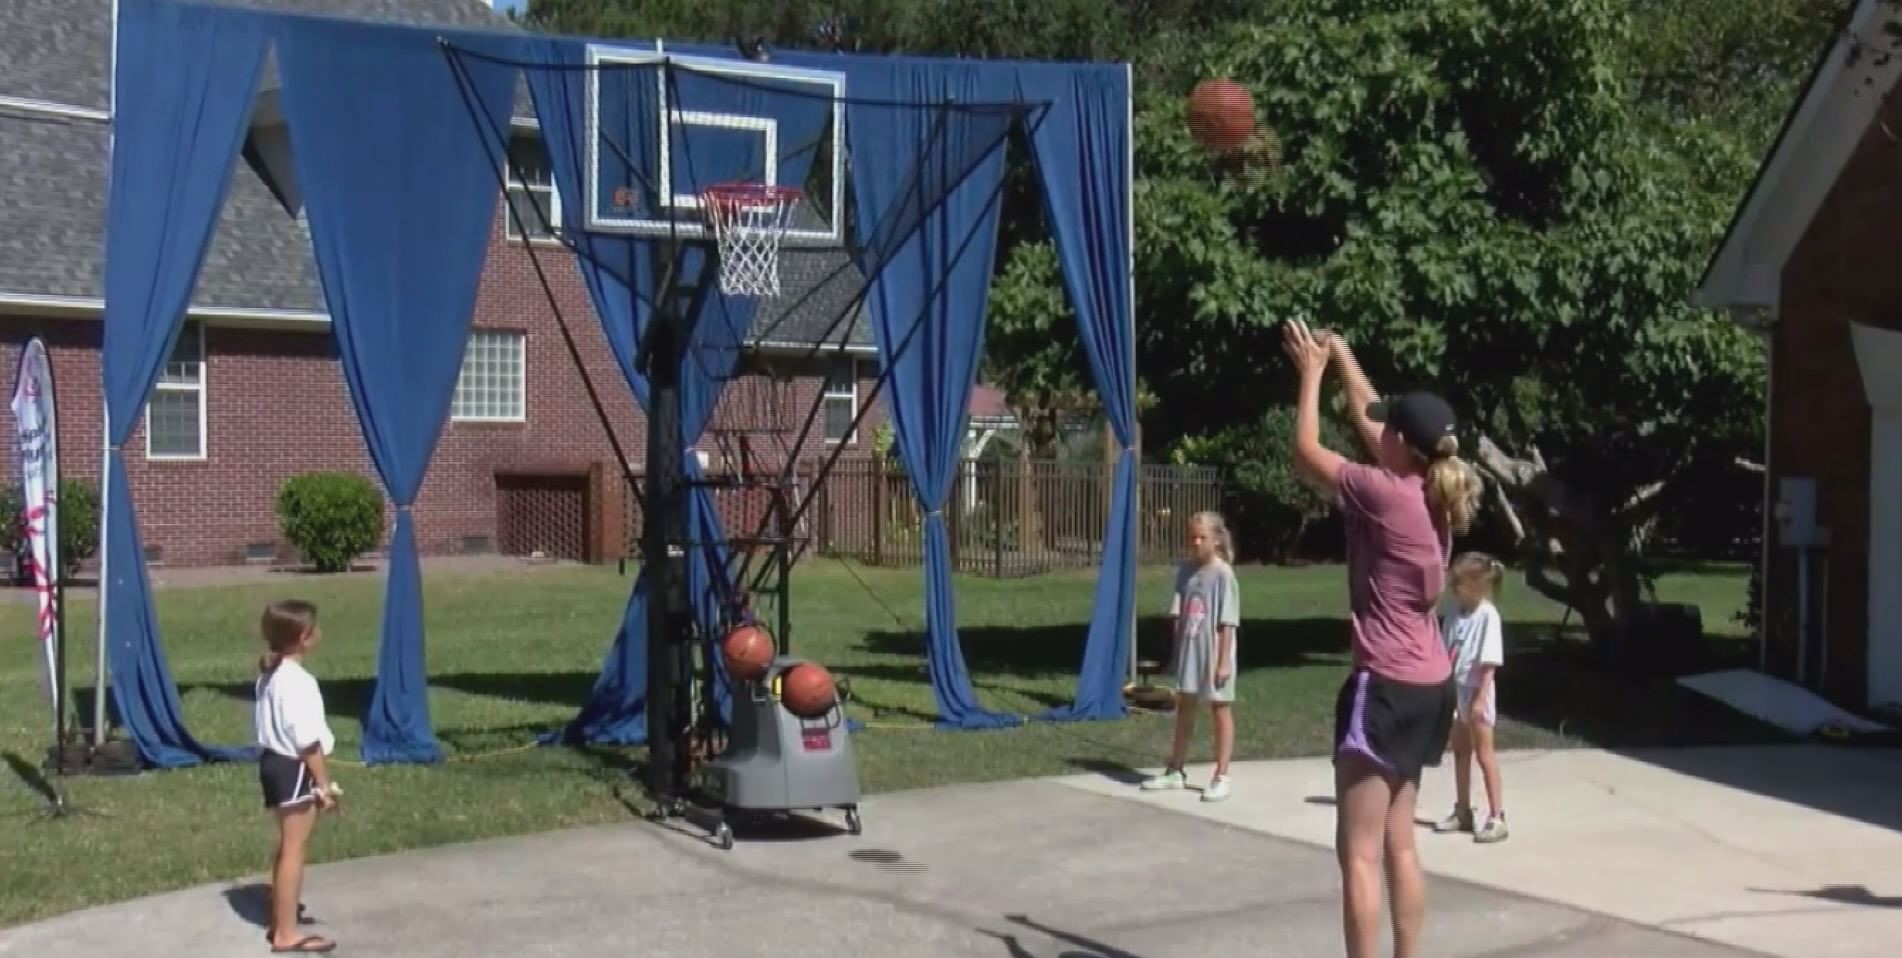 How Debbie Antonelli Raised Over $120,000 for Special Olympics